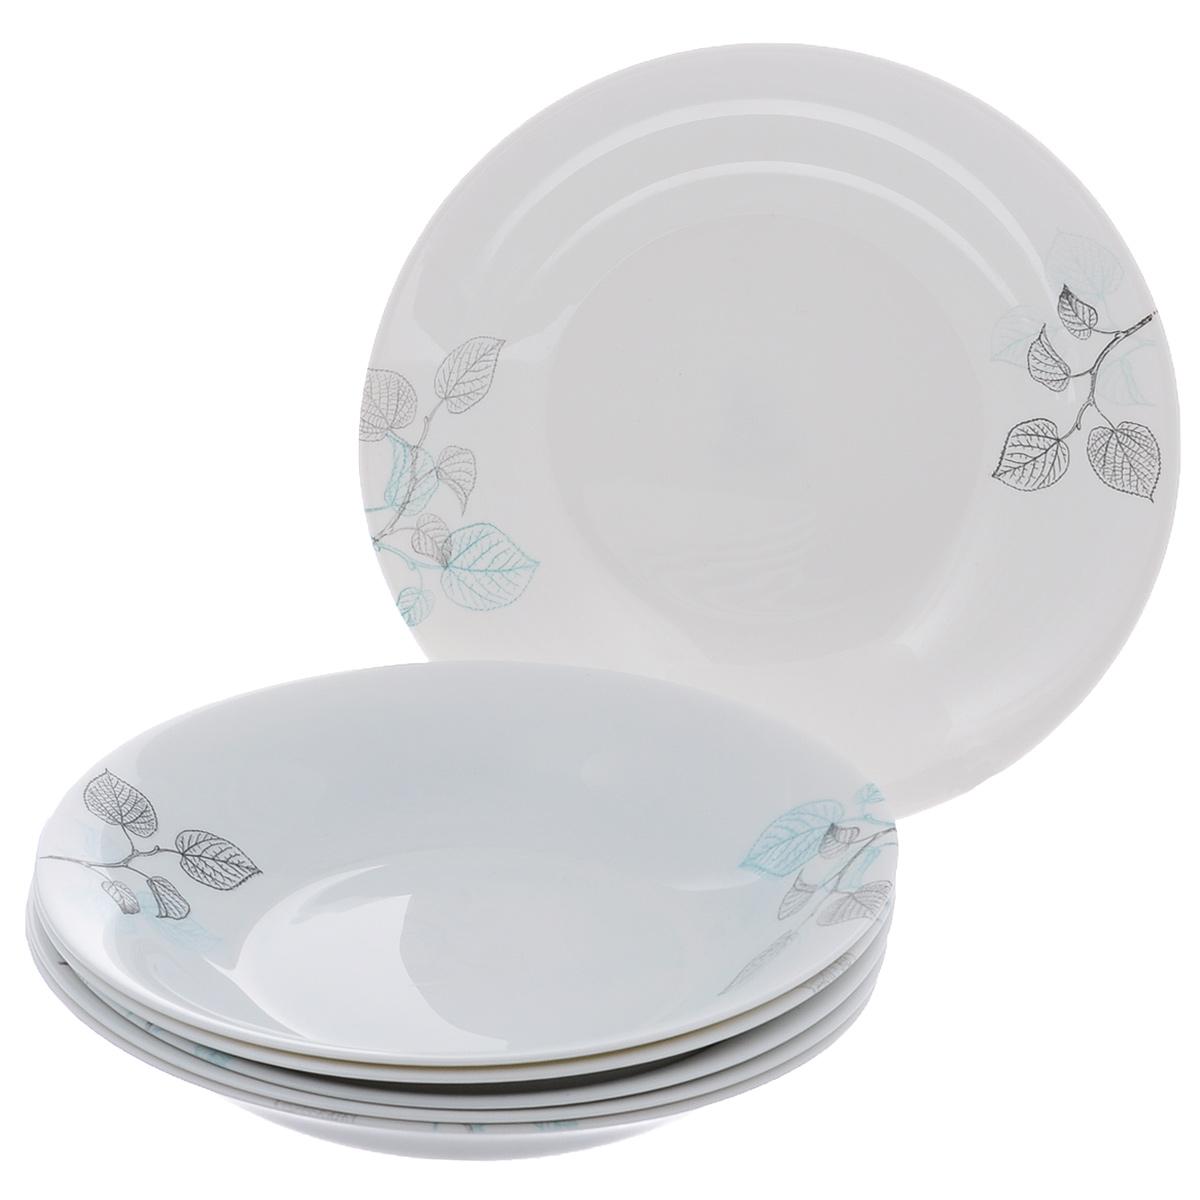 Набор суповых тарелок Bormioli Rocco Moon Foliage, диаметр 23 см, 6 шт кольца колечки кольцо эвита авантюрин